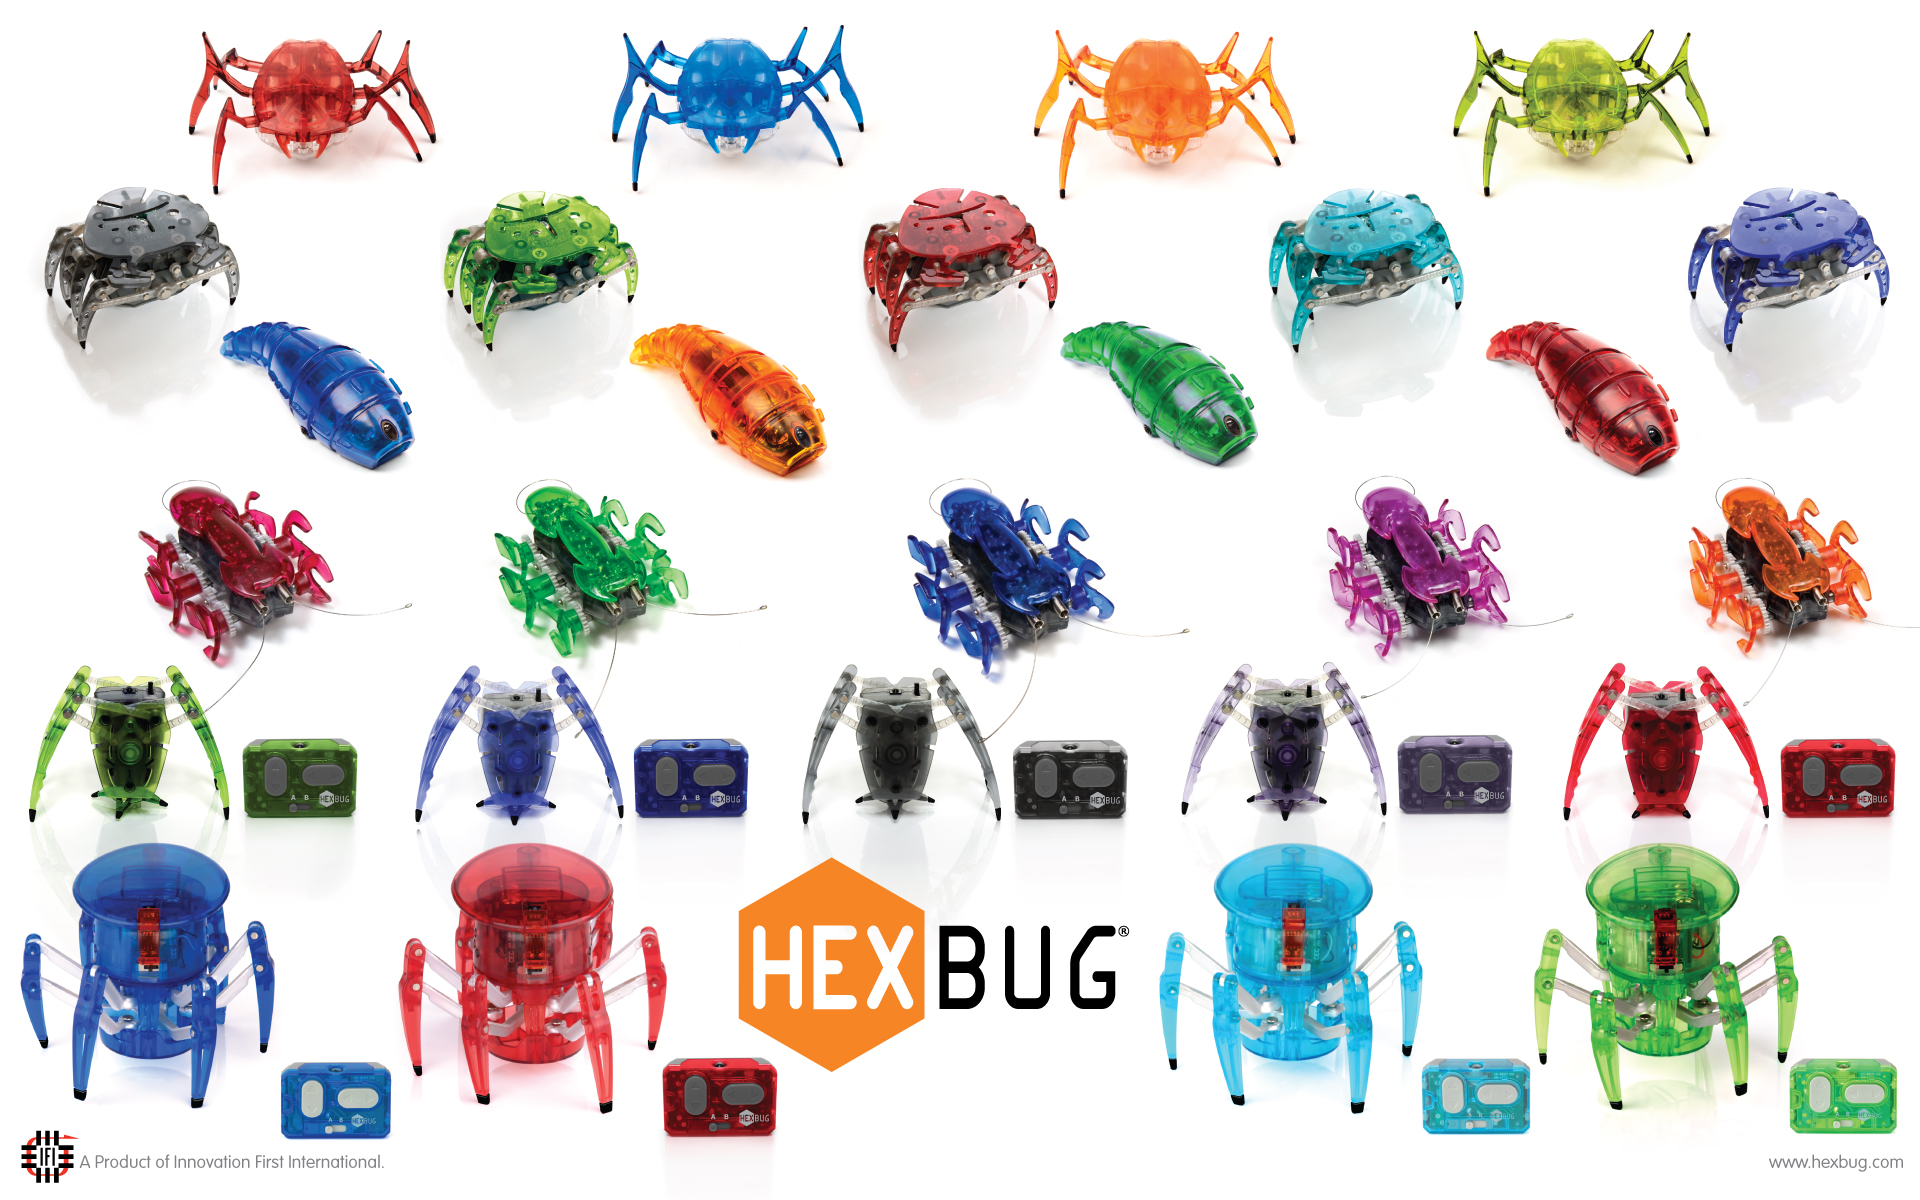 Cool Bug Toys : Enginursday arduino celebration and hexbugs hacking with